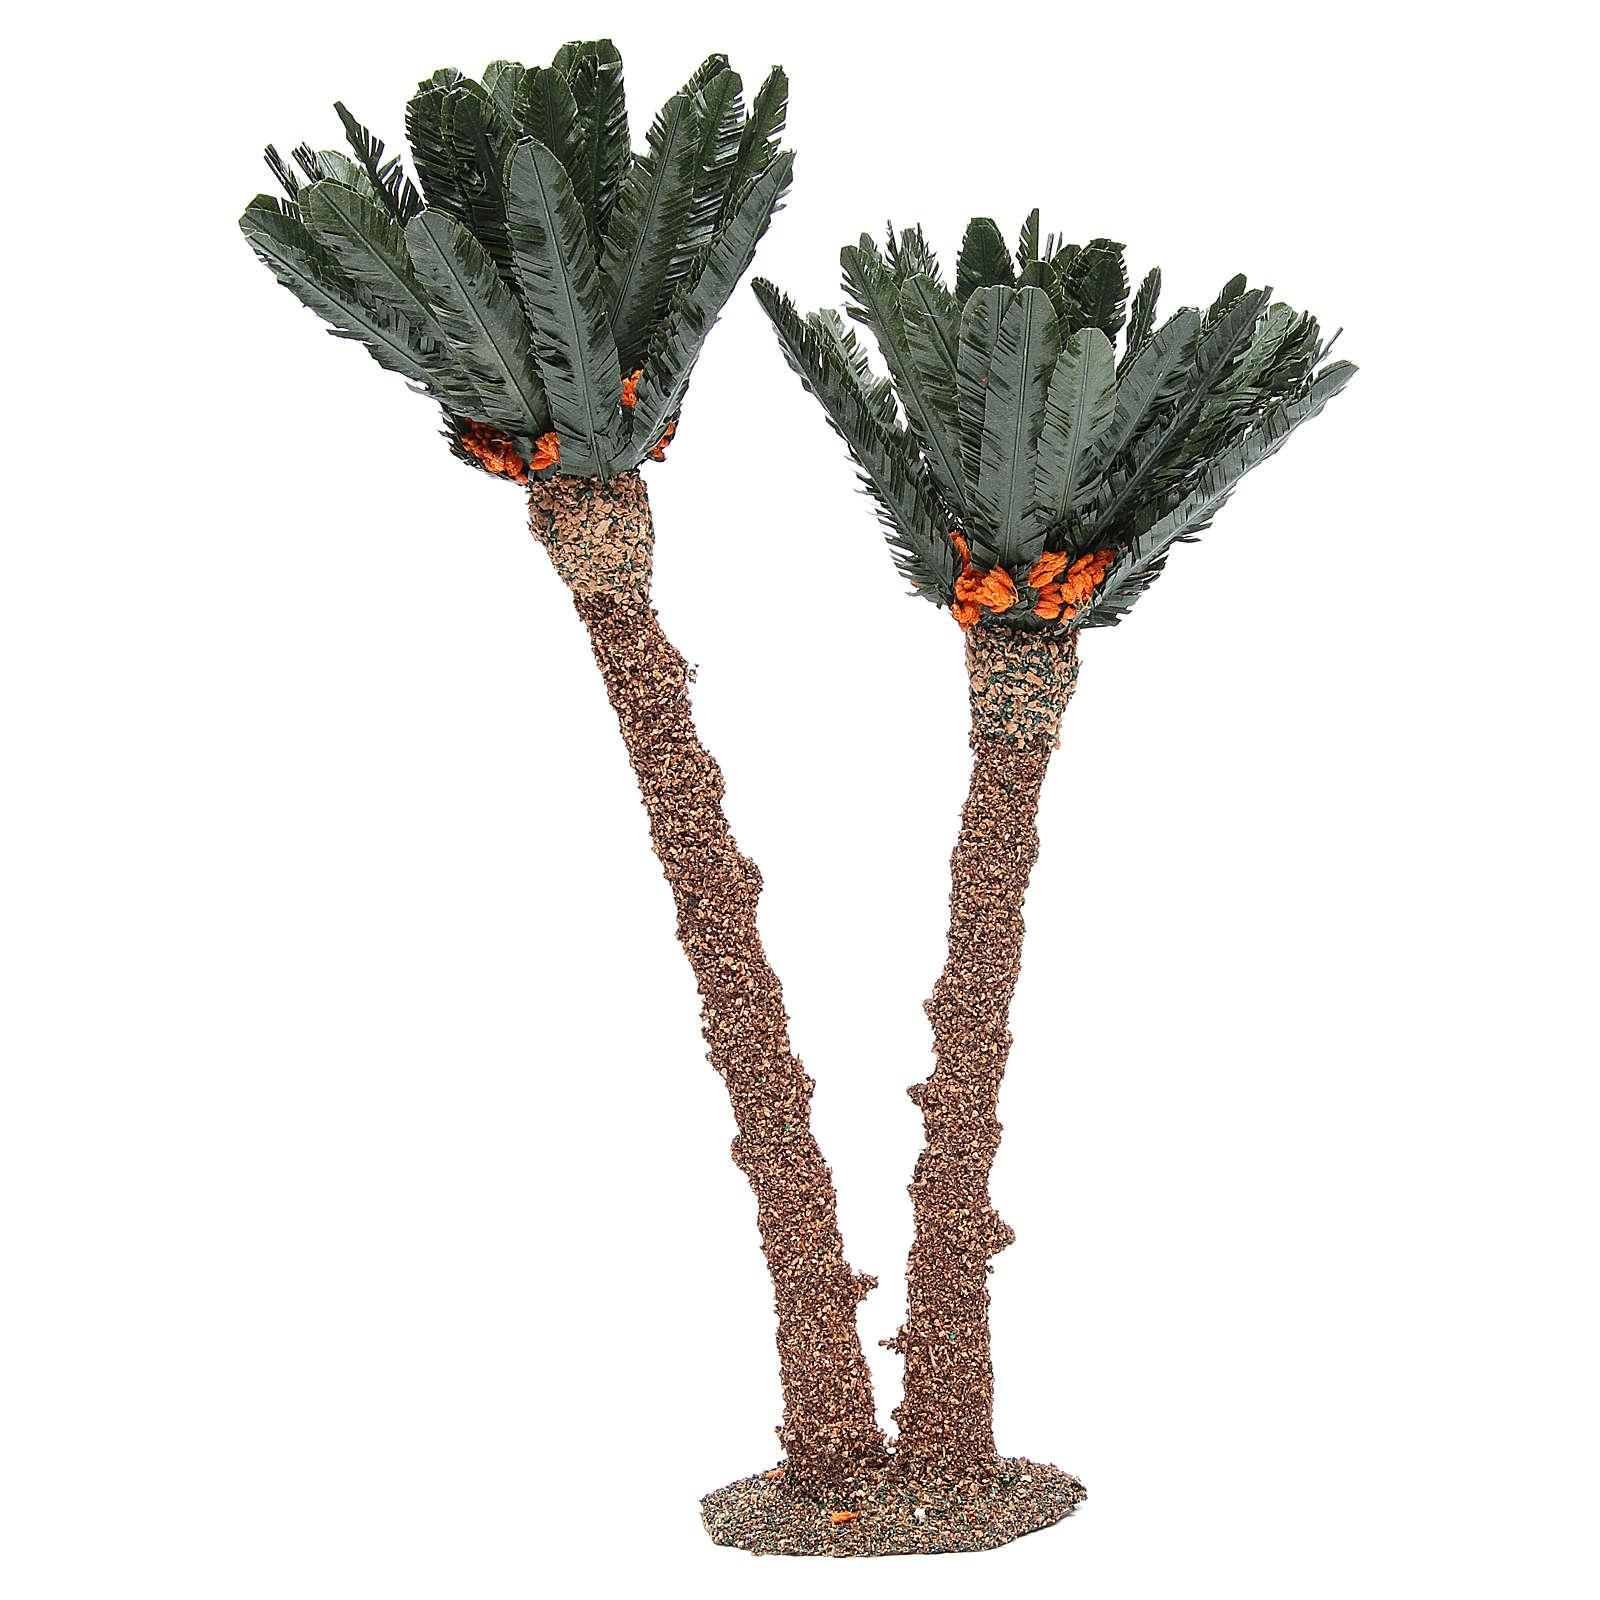 Double palm for nativity scene in cork, 40cm 4